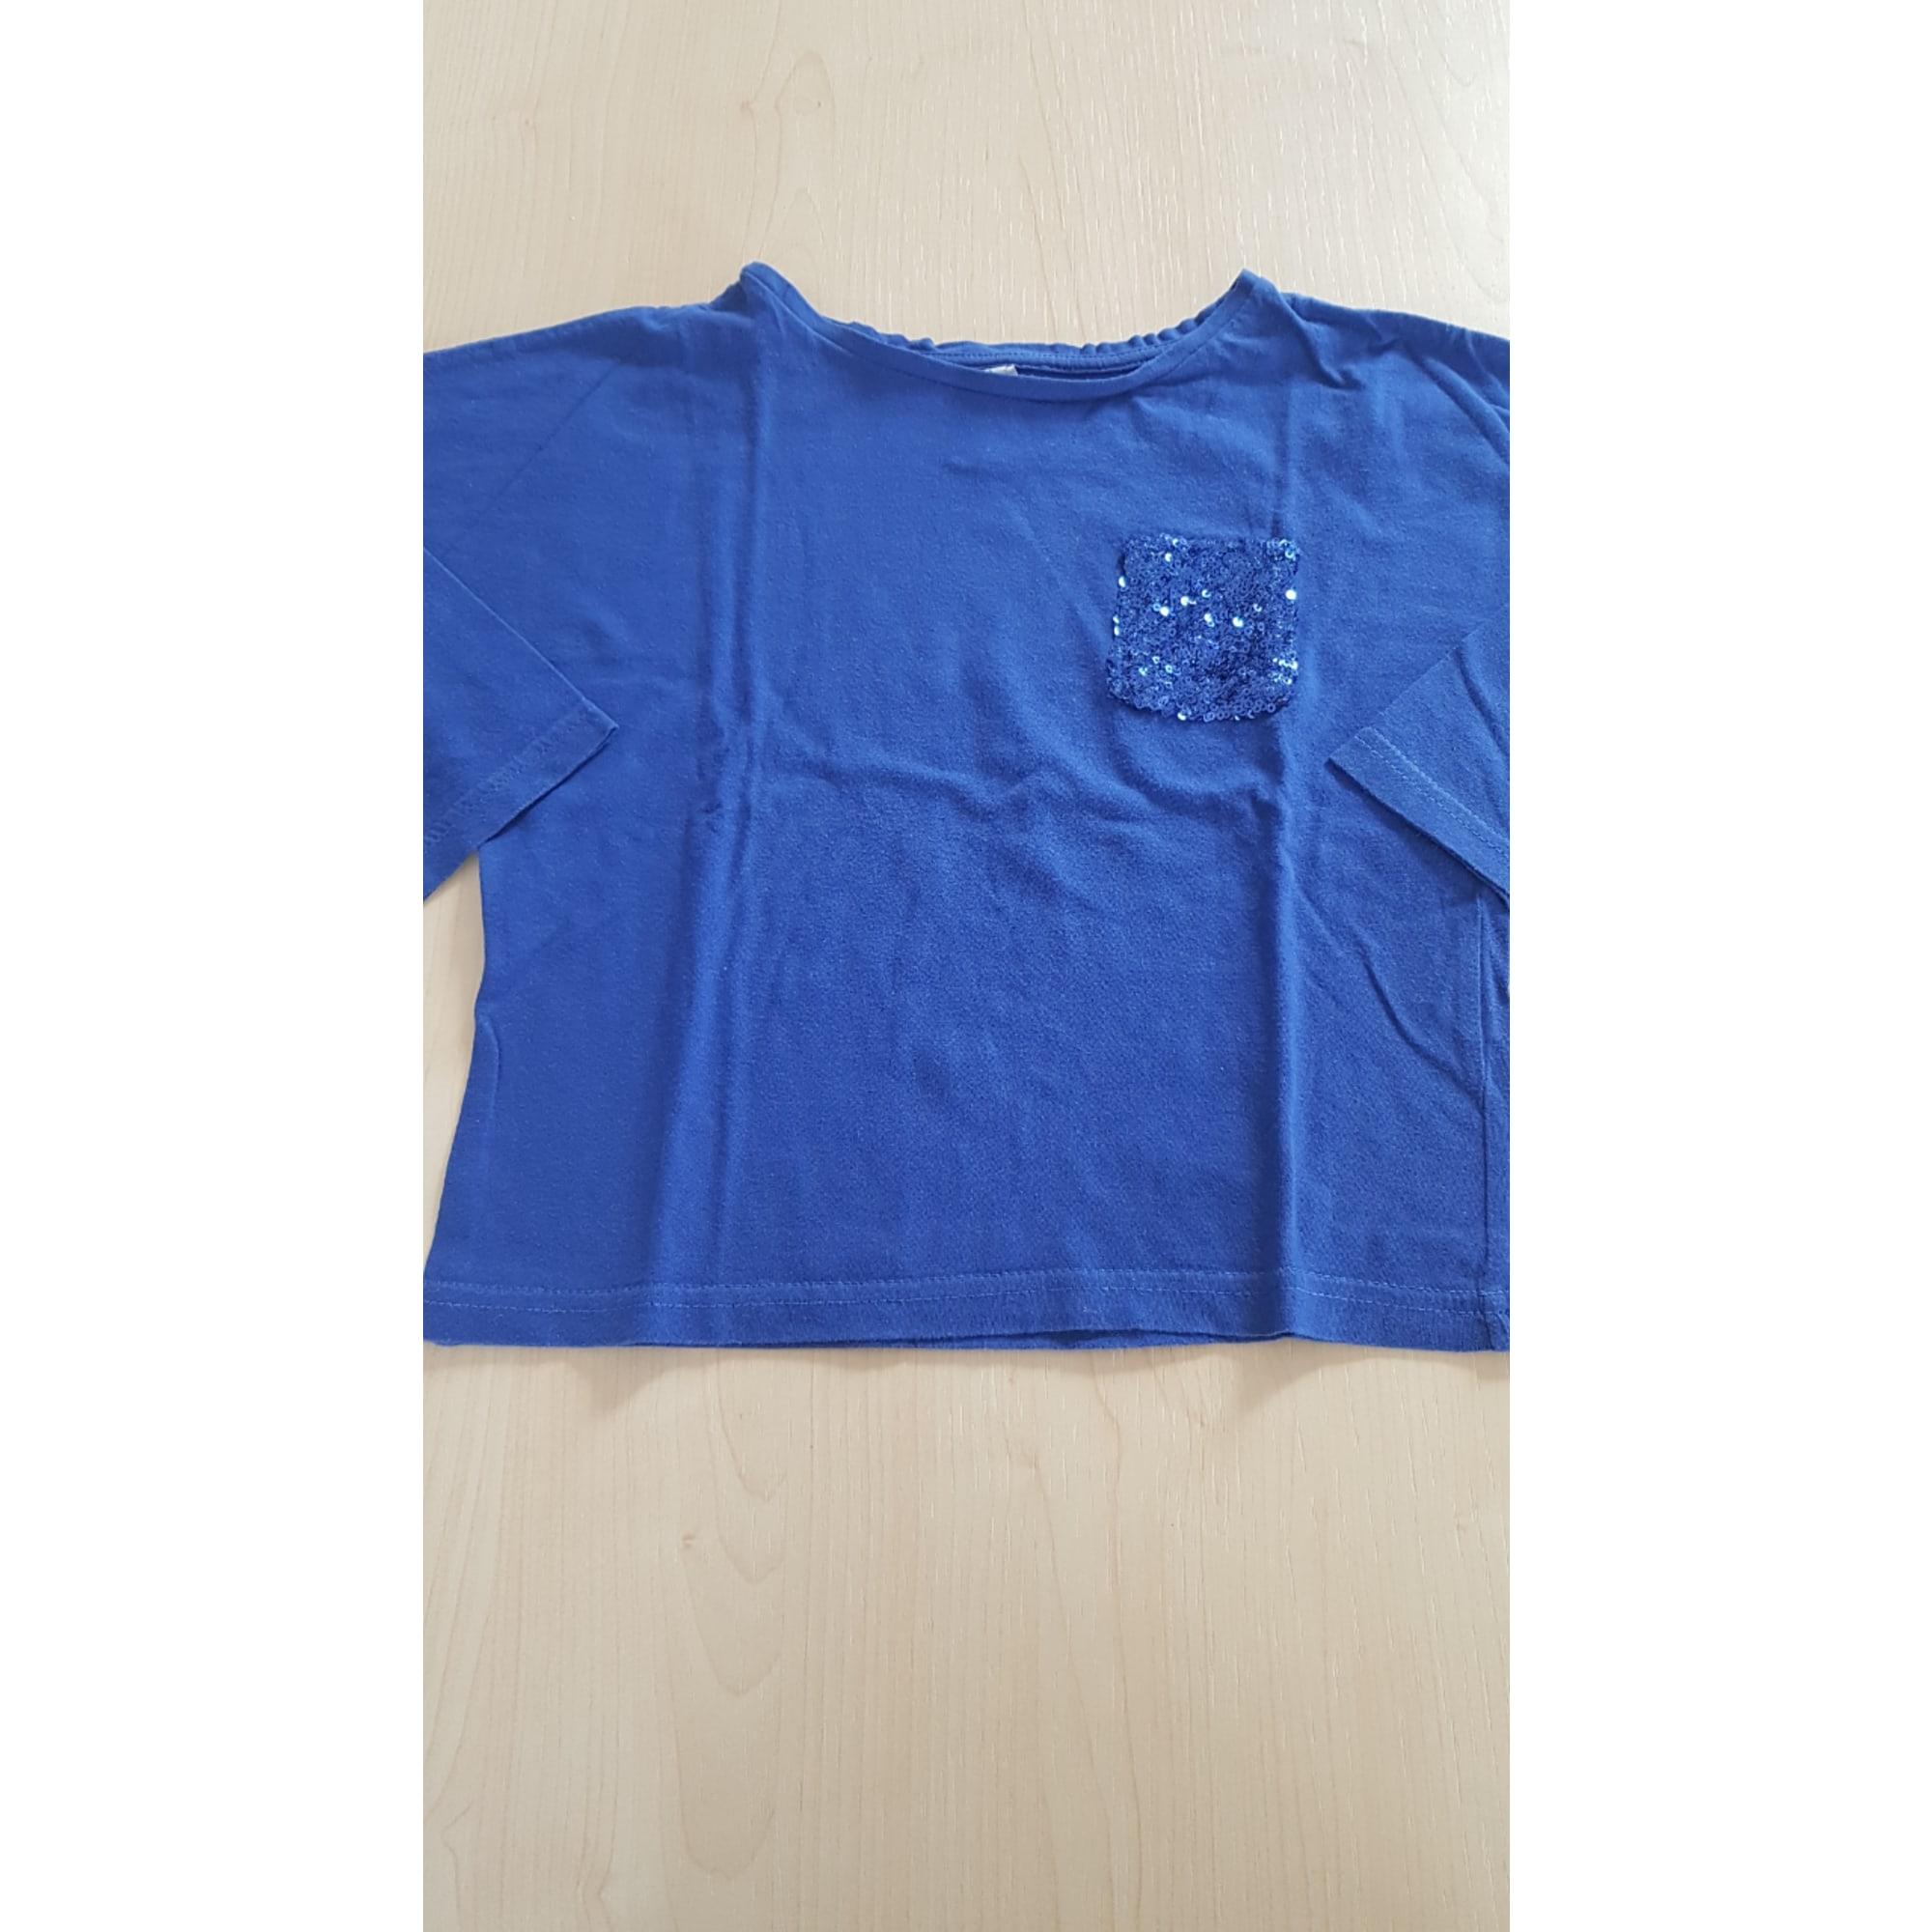 Top, Tee-shirt KID'S GRAFFITI Bleu, bleu marine, bleu turquoise